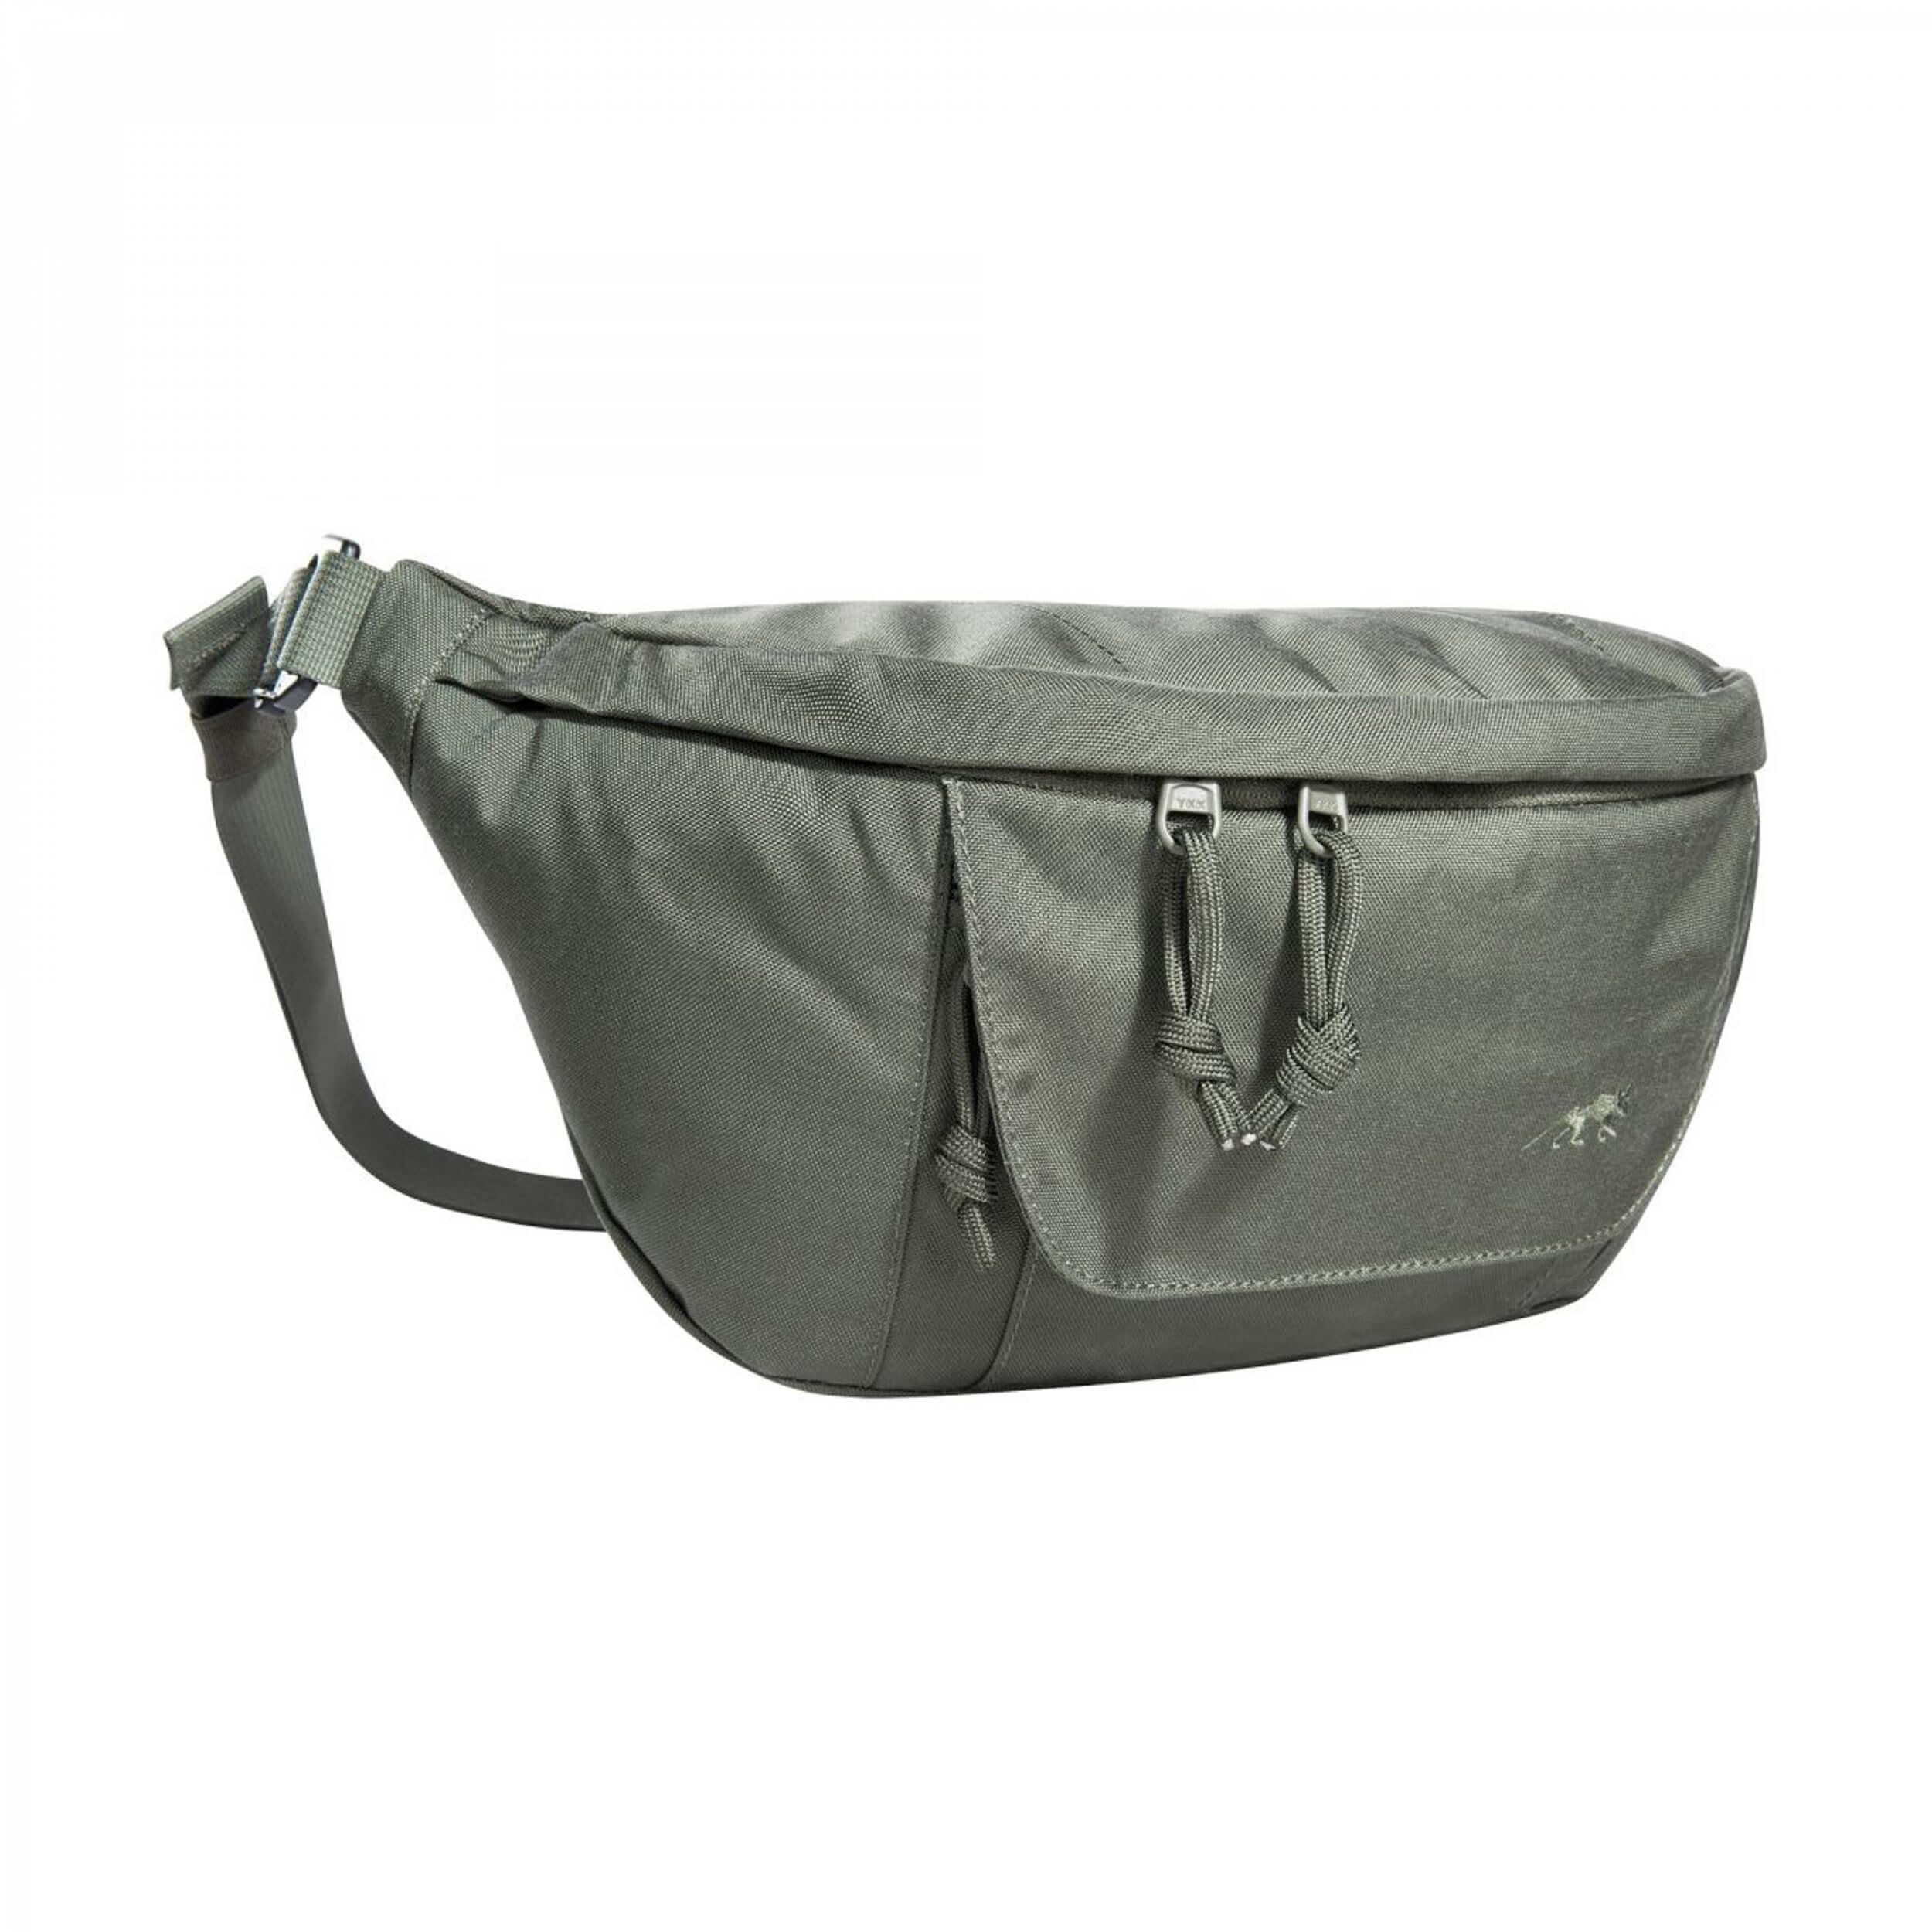 Tasmanian Tiger Modular Hip Bag 2 stone grey olive